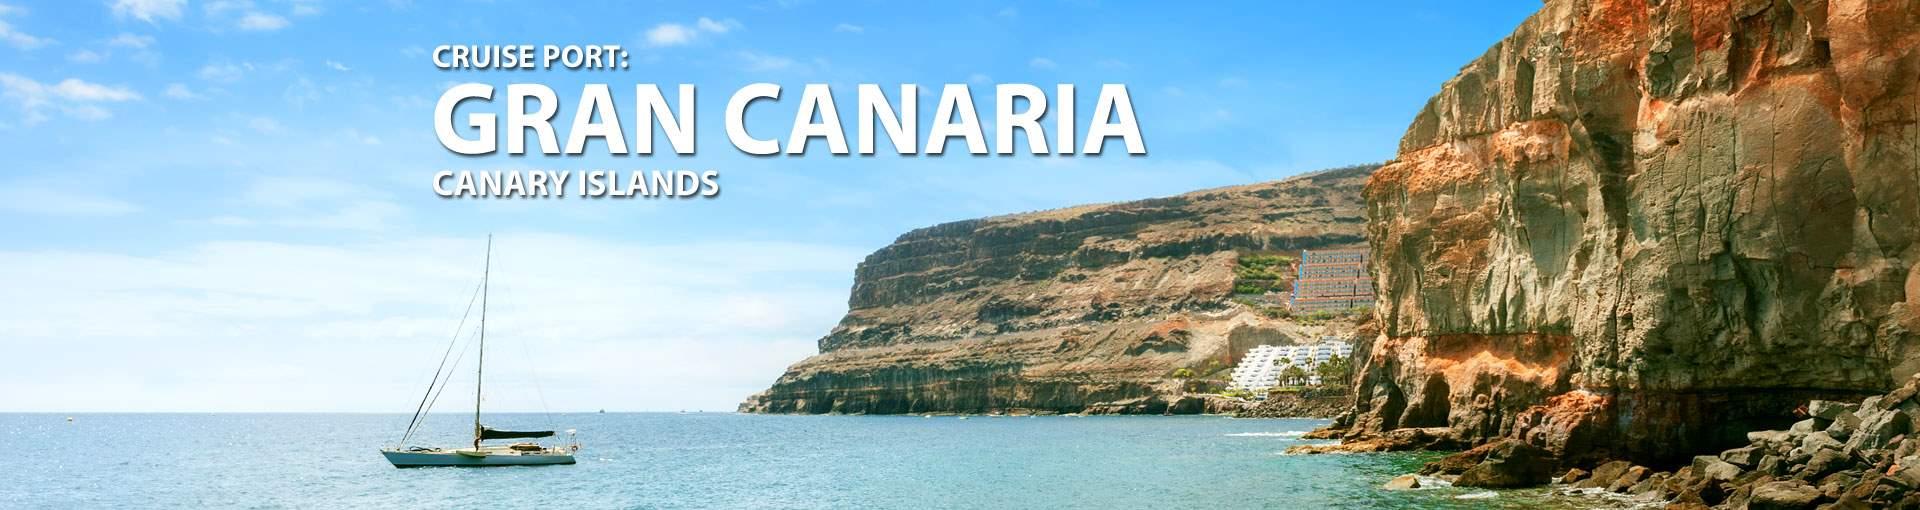 Cruises to Gran Canaria, Canary Islands